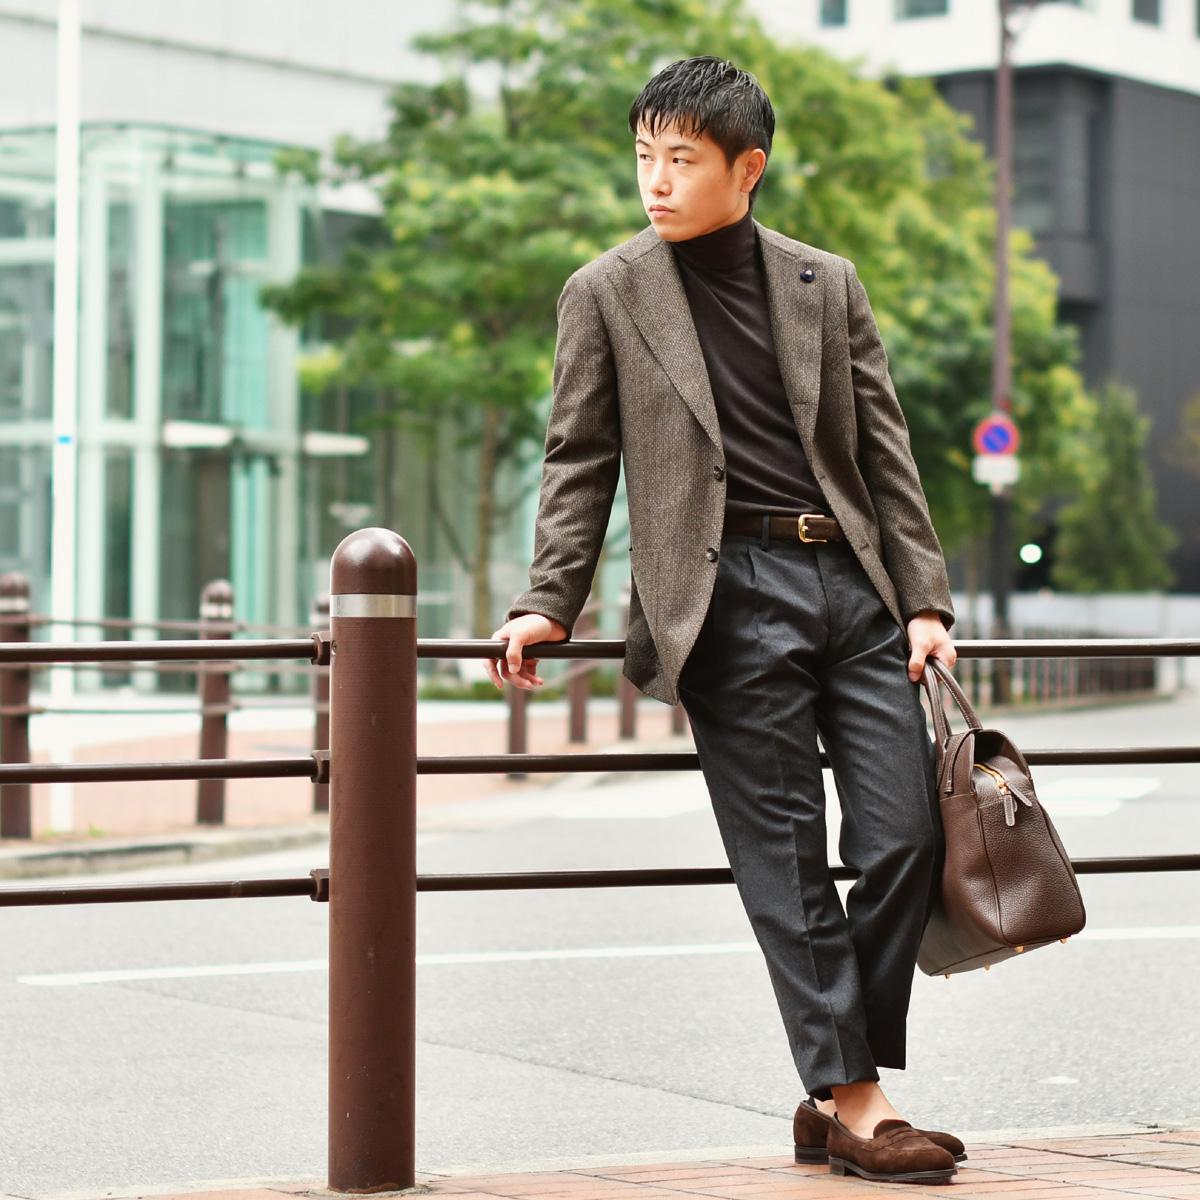 BROWN & GREYで纏めた大人のジャケットスタイルLARDINI【ラルディーニ】